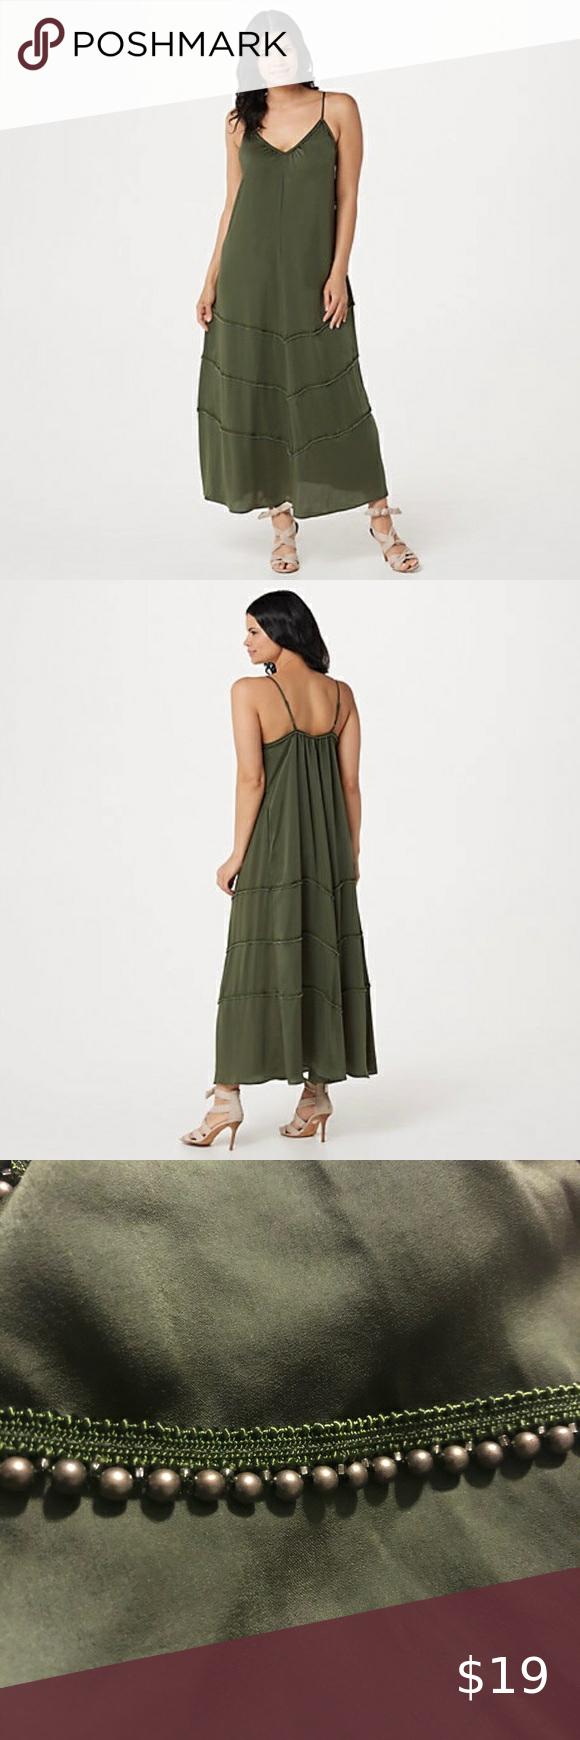 Rachel Hollis Peasant Dress With Beading Detail Xl Excellent Preowned Condition Qvc Dresses Maxi Dresses Peasant Dress Womens Dresses [ 1740 x 580 Pixel ]